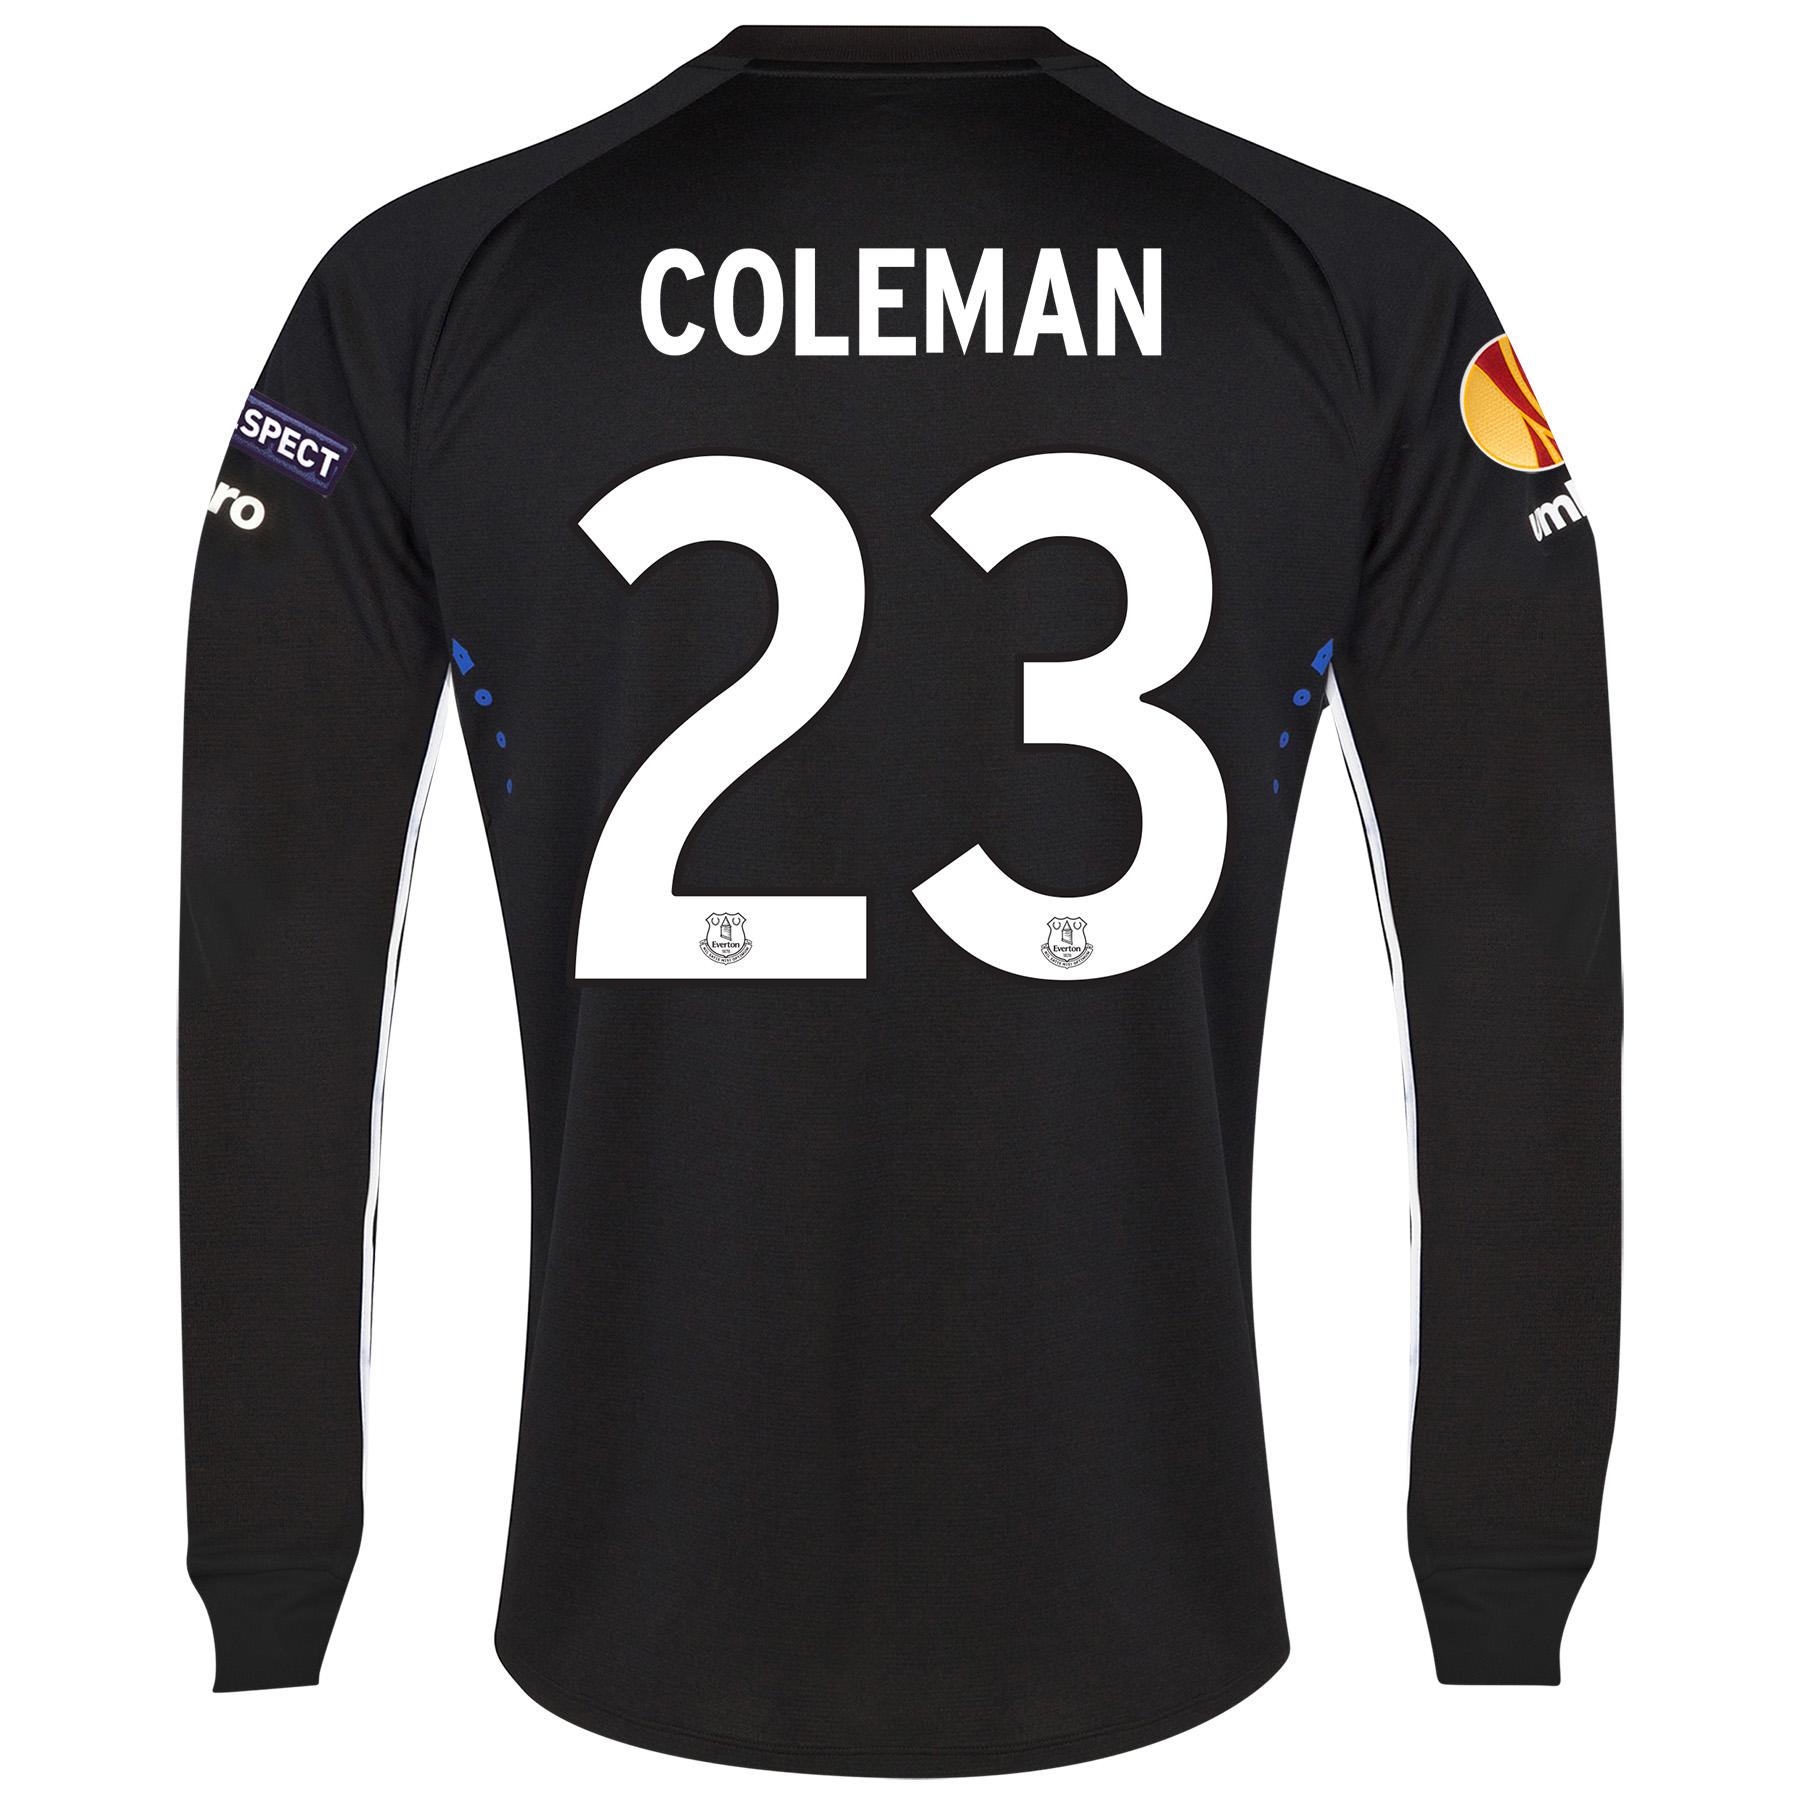 Everton UEFA Europa League Away Shirt 2014/15 LS with Coleman 23 printing